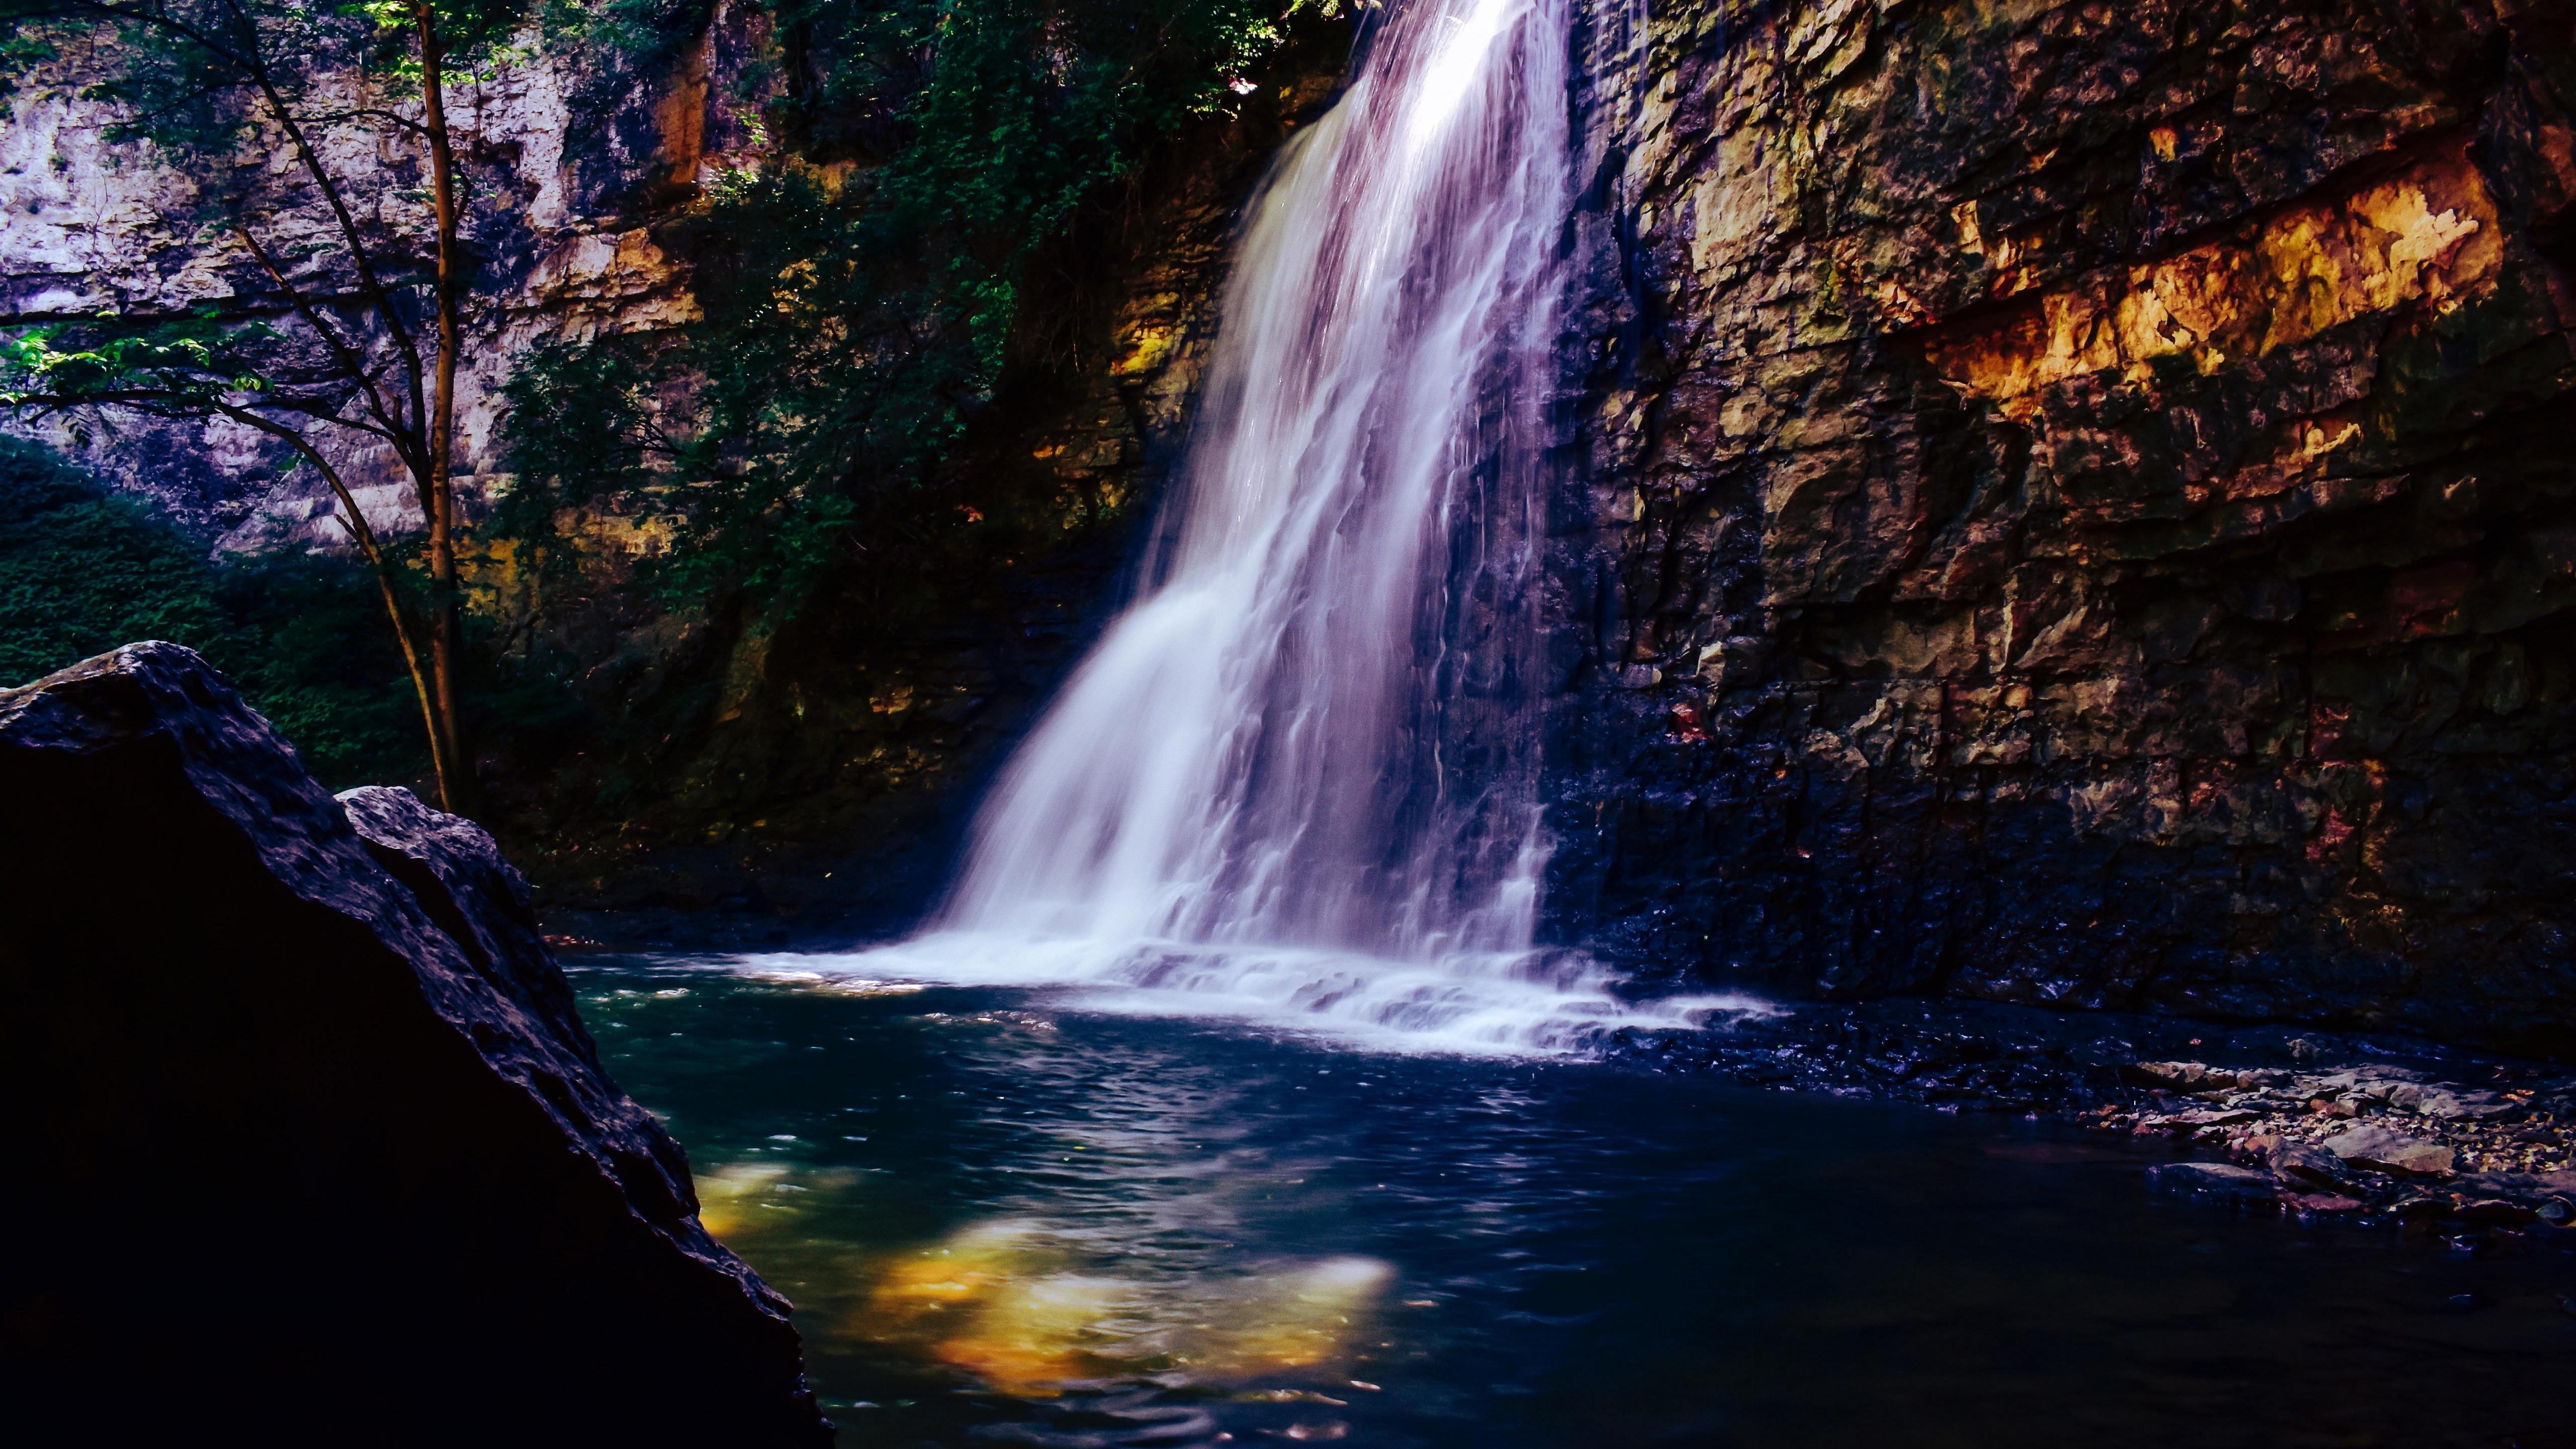 Nature Waterfall Water Current 5120x2880 5k Wallpaper